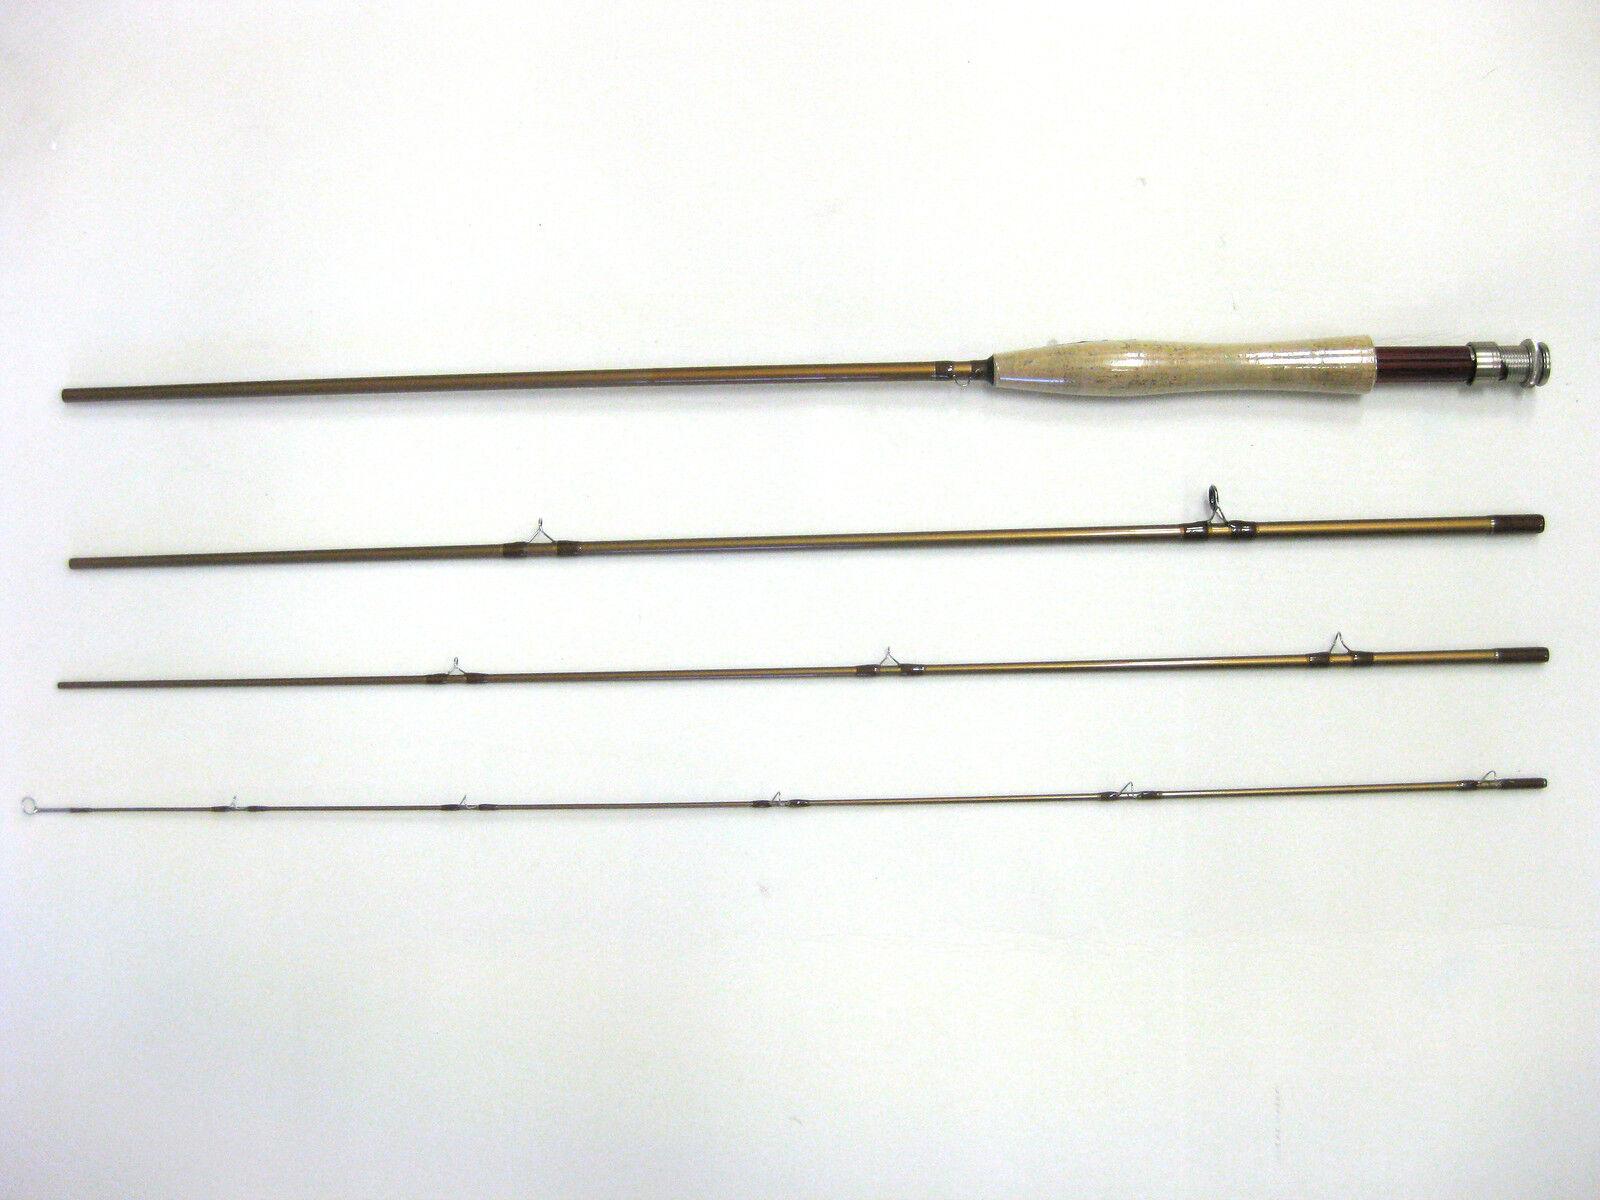 KUFA 4 section graphite  4 Fly  Fishing Rod (L 9 Ft, LW   4 Act  M) KFL9434  big sale